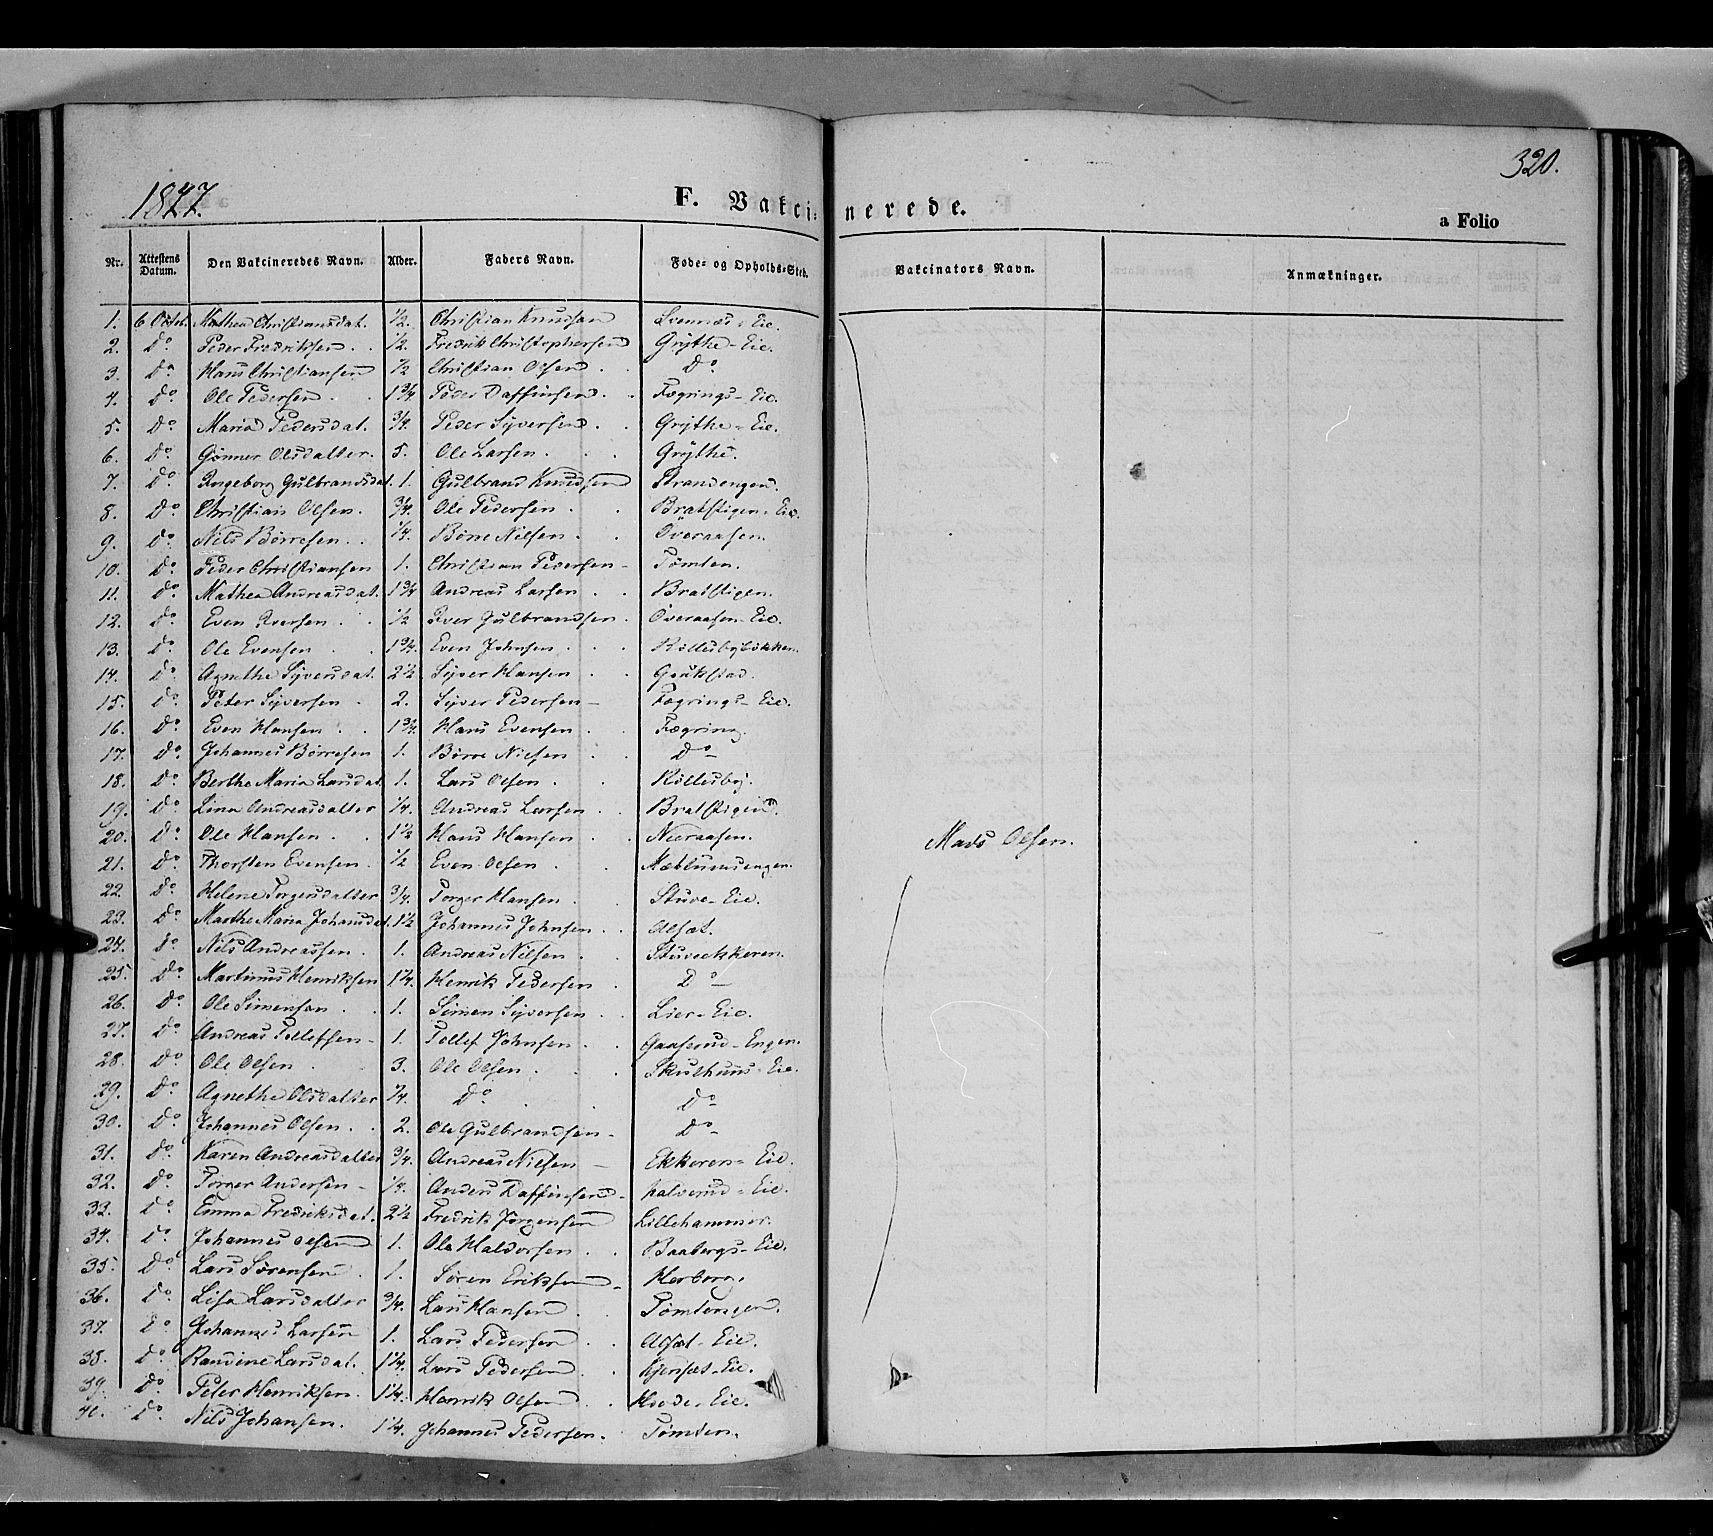 SAH, Biri prestekontor, Ministerialbok nr. 5, 1843-1854, s. 320